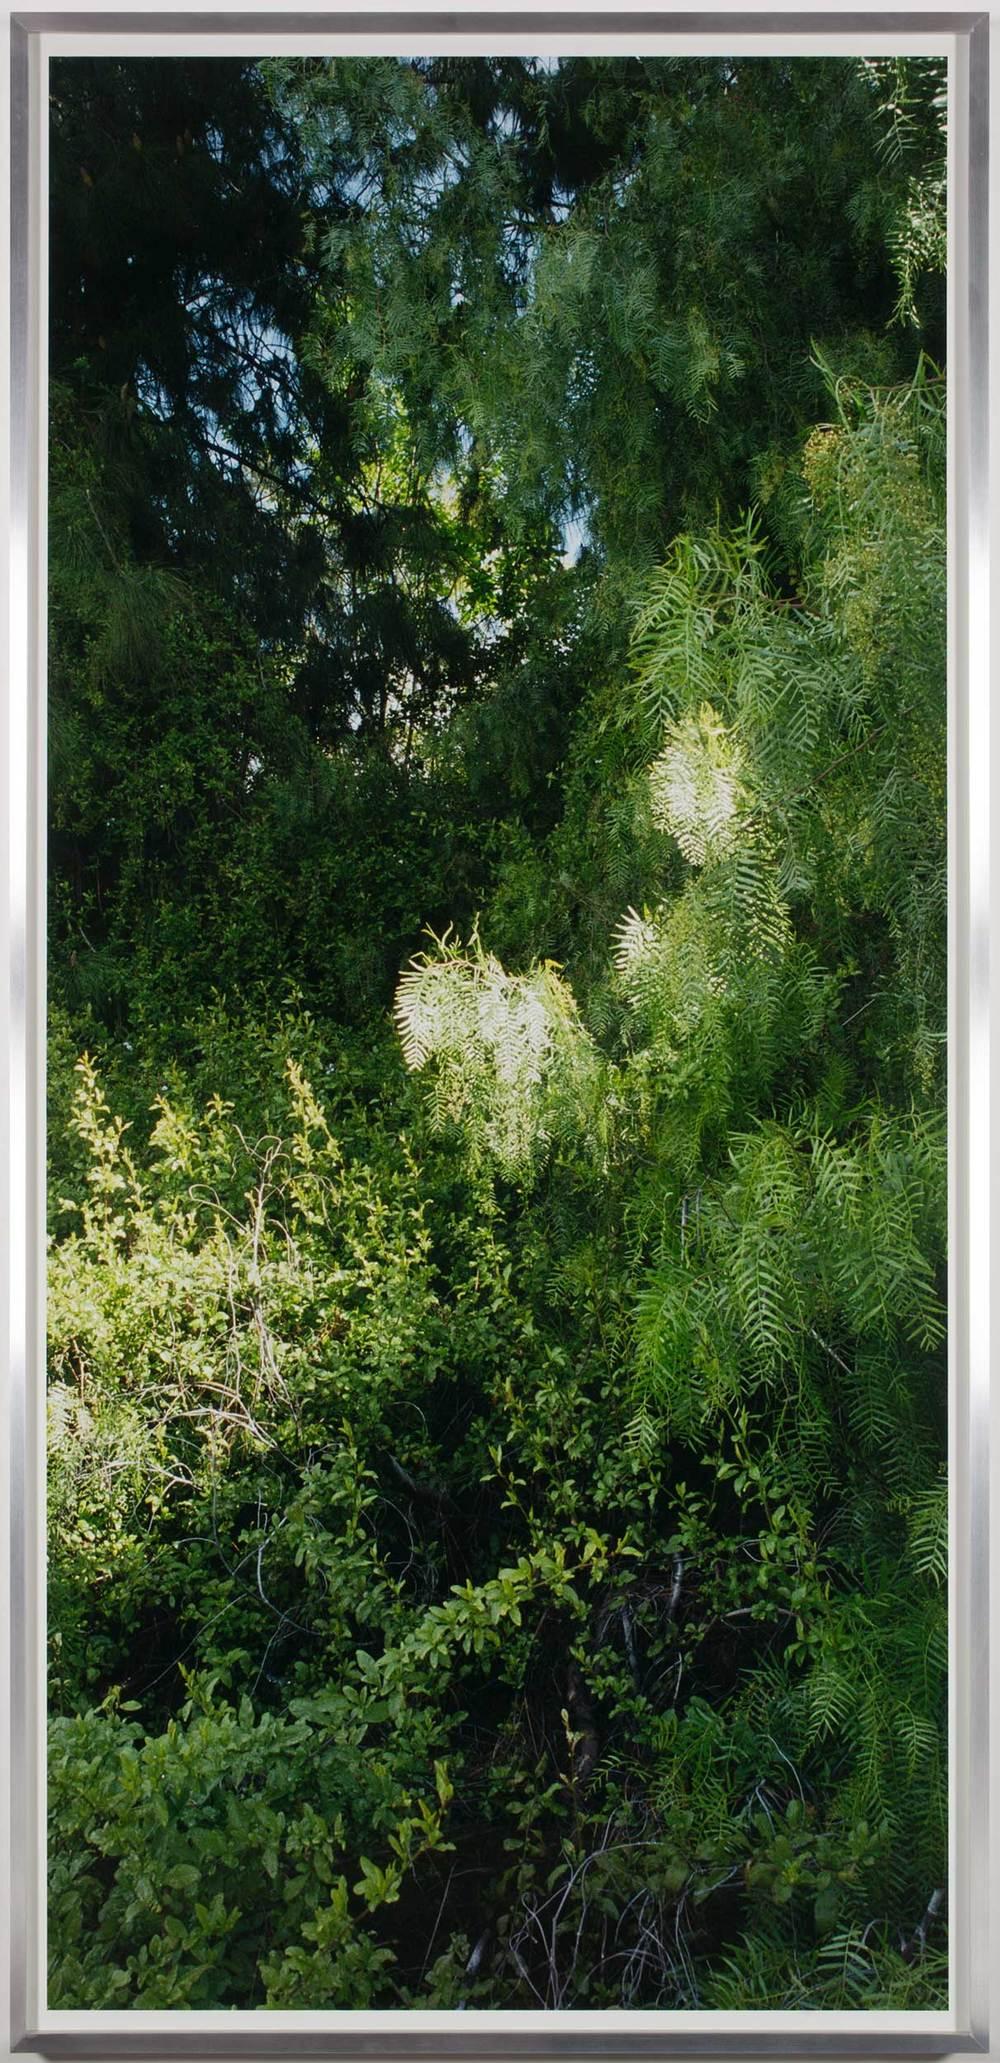 Island Flora #8 (Rte. 101 and Rte. 110 Interchange)    2005   Chromogenic print  99 1/2 x 47 1/2 inches